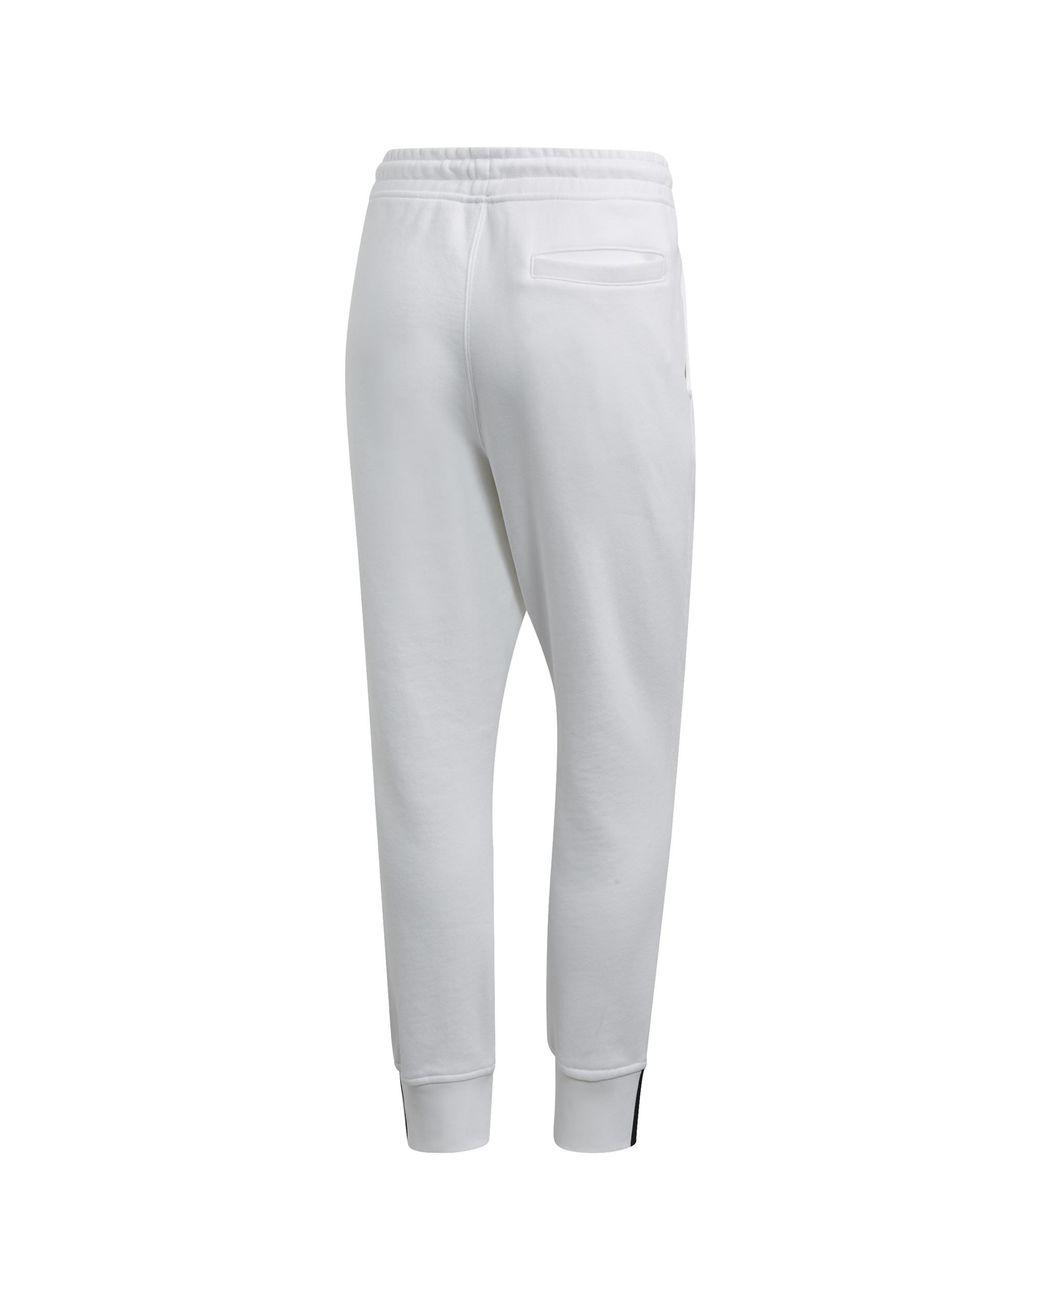 adidas Originals Adicolor 3 Stripe Leggings Women's at Eastbay Team Sales